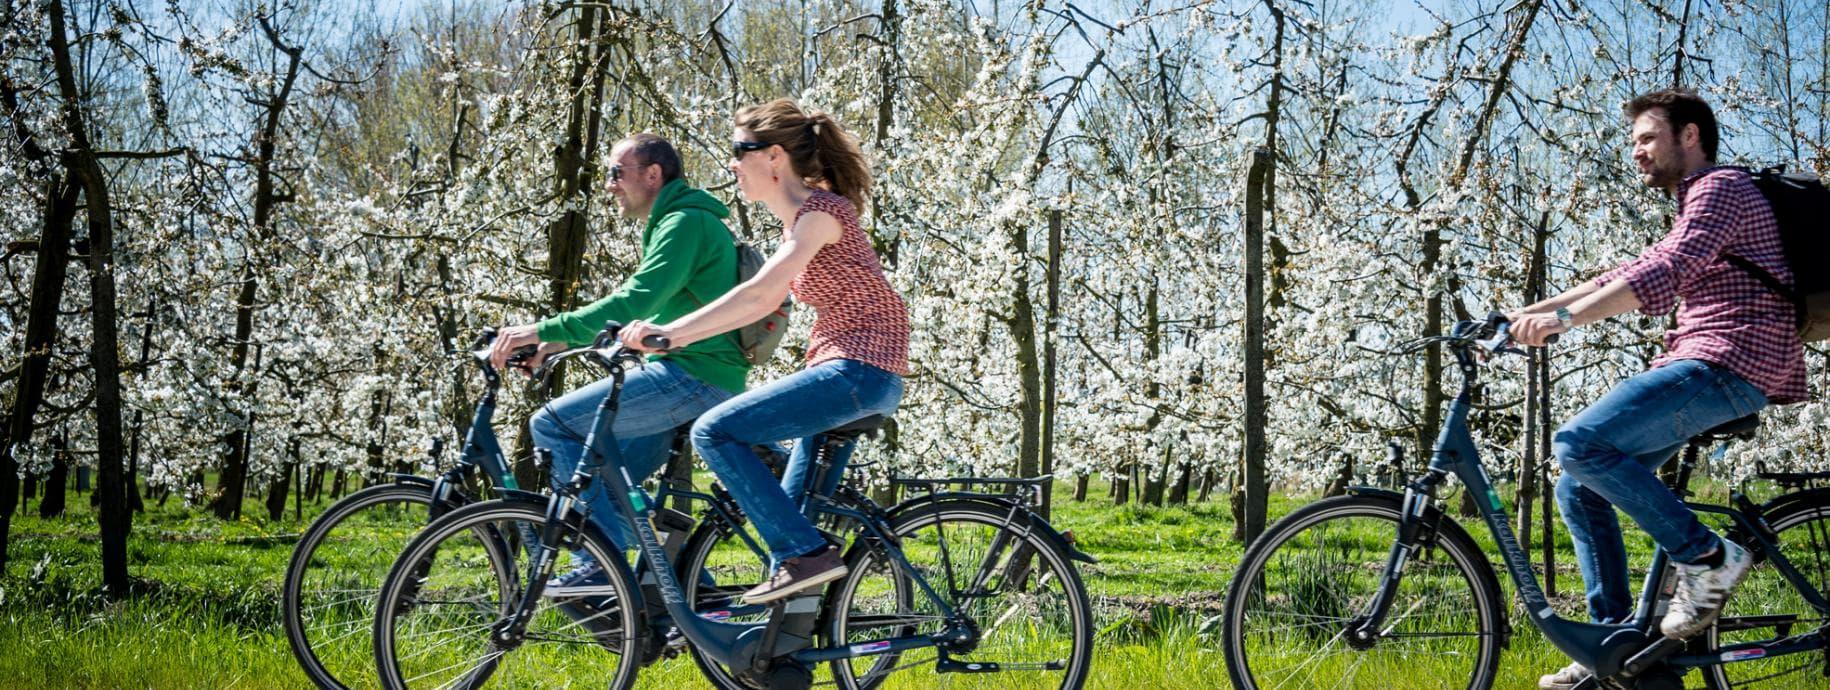 fietsers dating gratis dating tips Videos